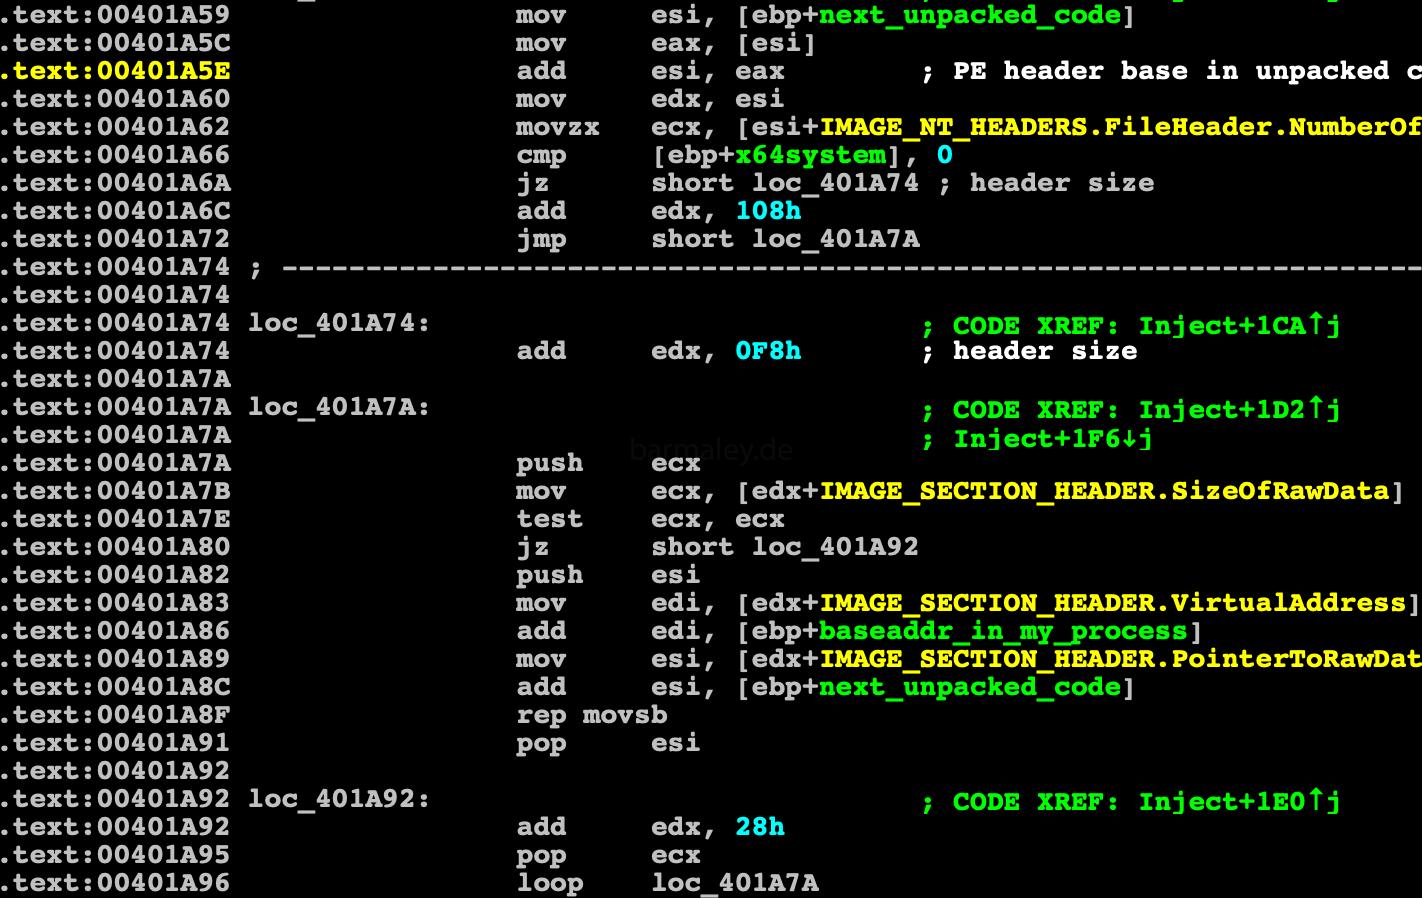 Ukraine under CyberAttack - Pentestmag